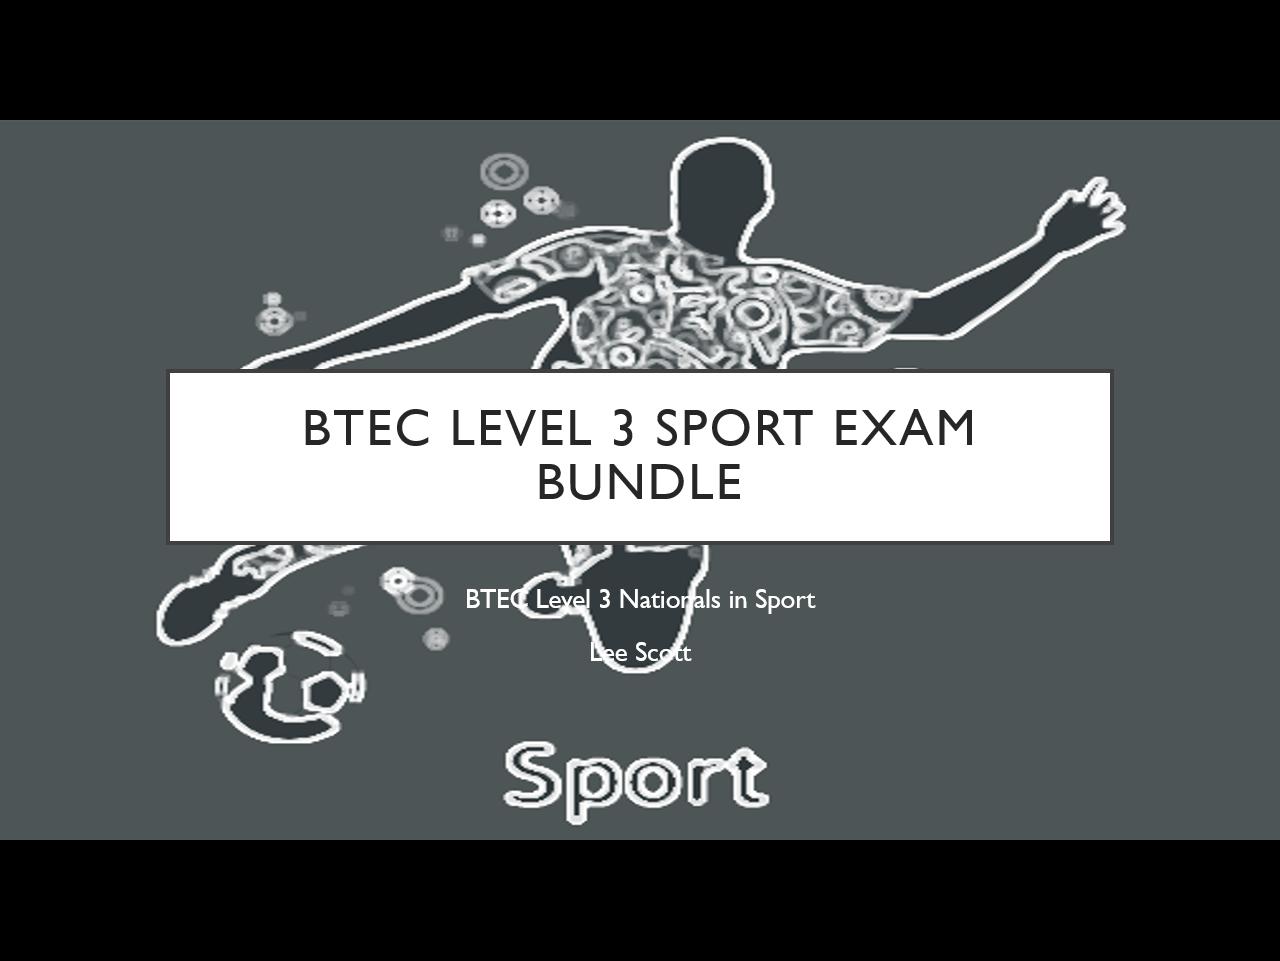 BTEC Level 3 Sport Exam Bundle